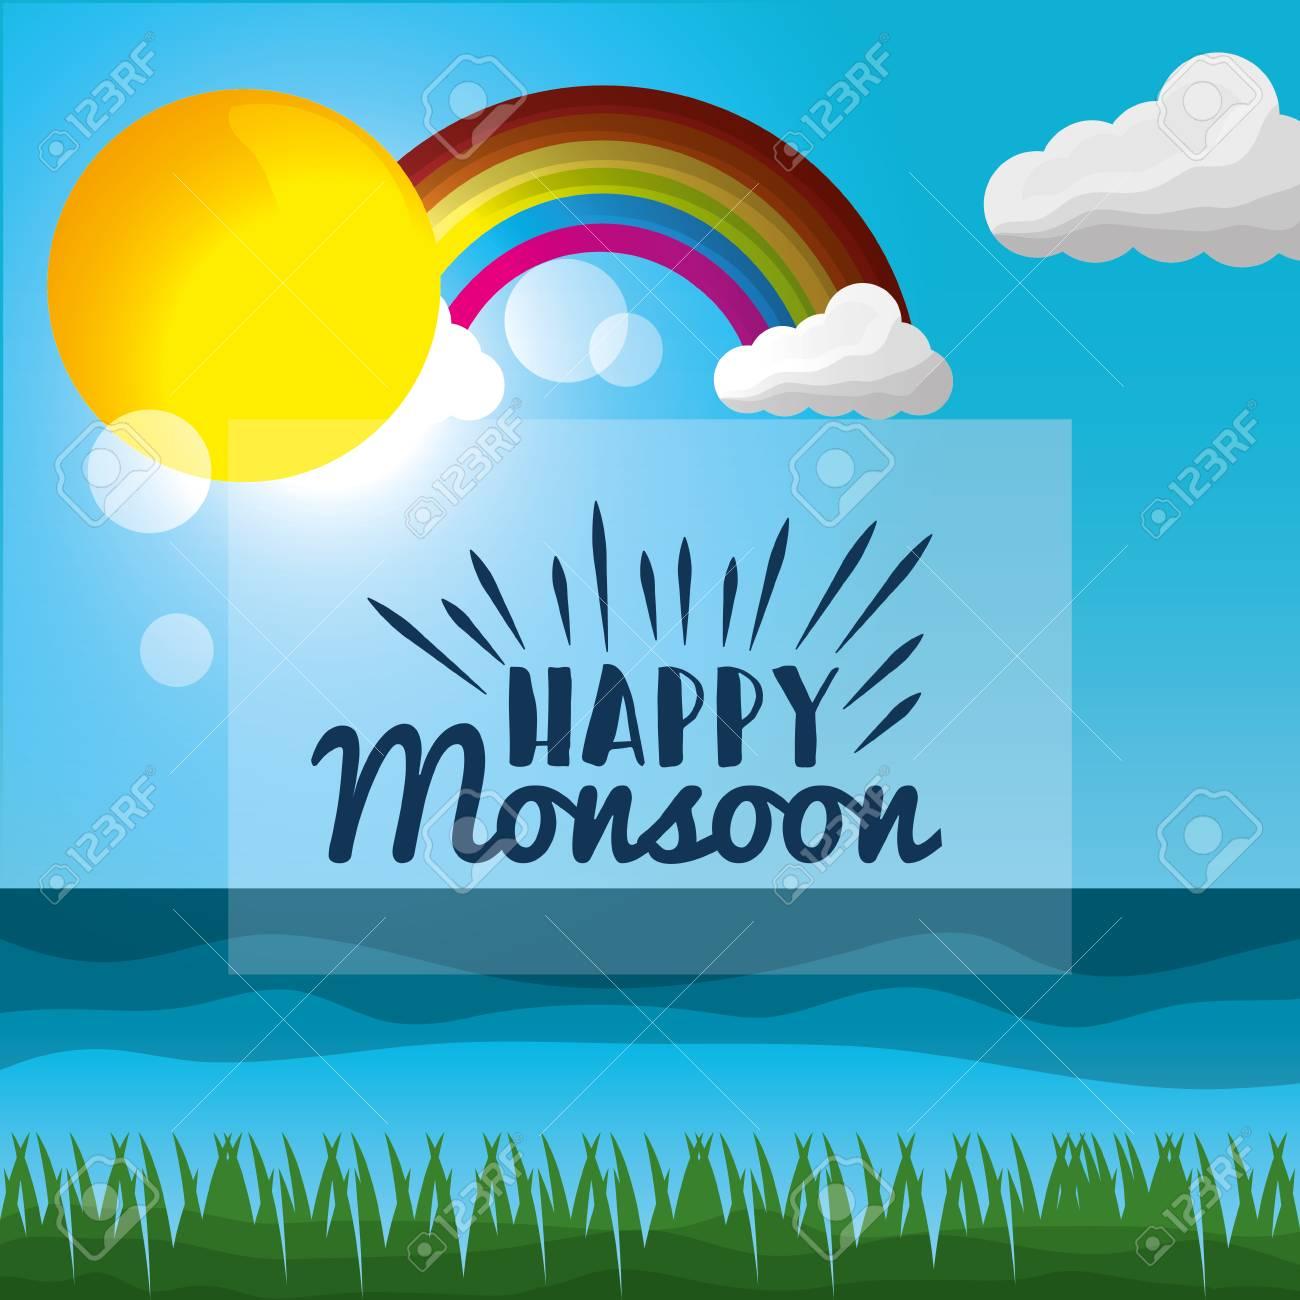 Happy Monsoon Season Colored Rainbow Sunshine Day Cloud Blur